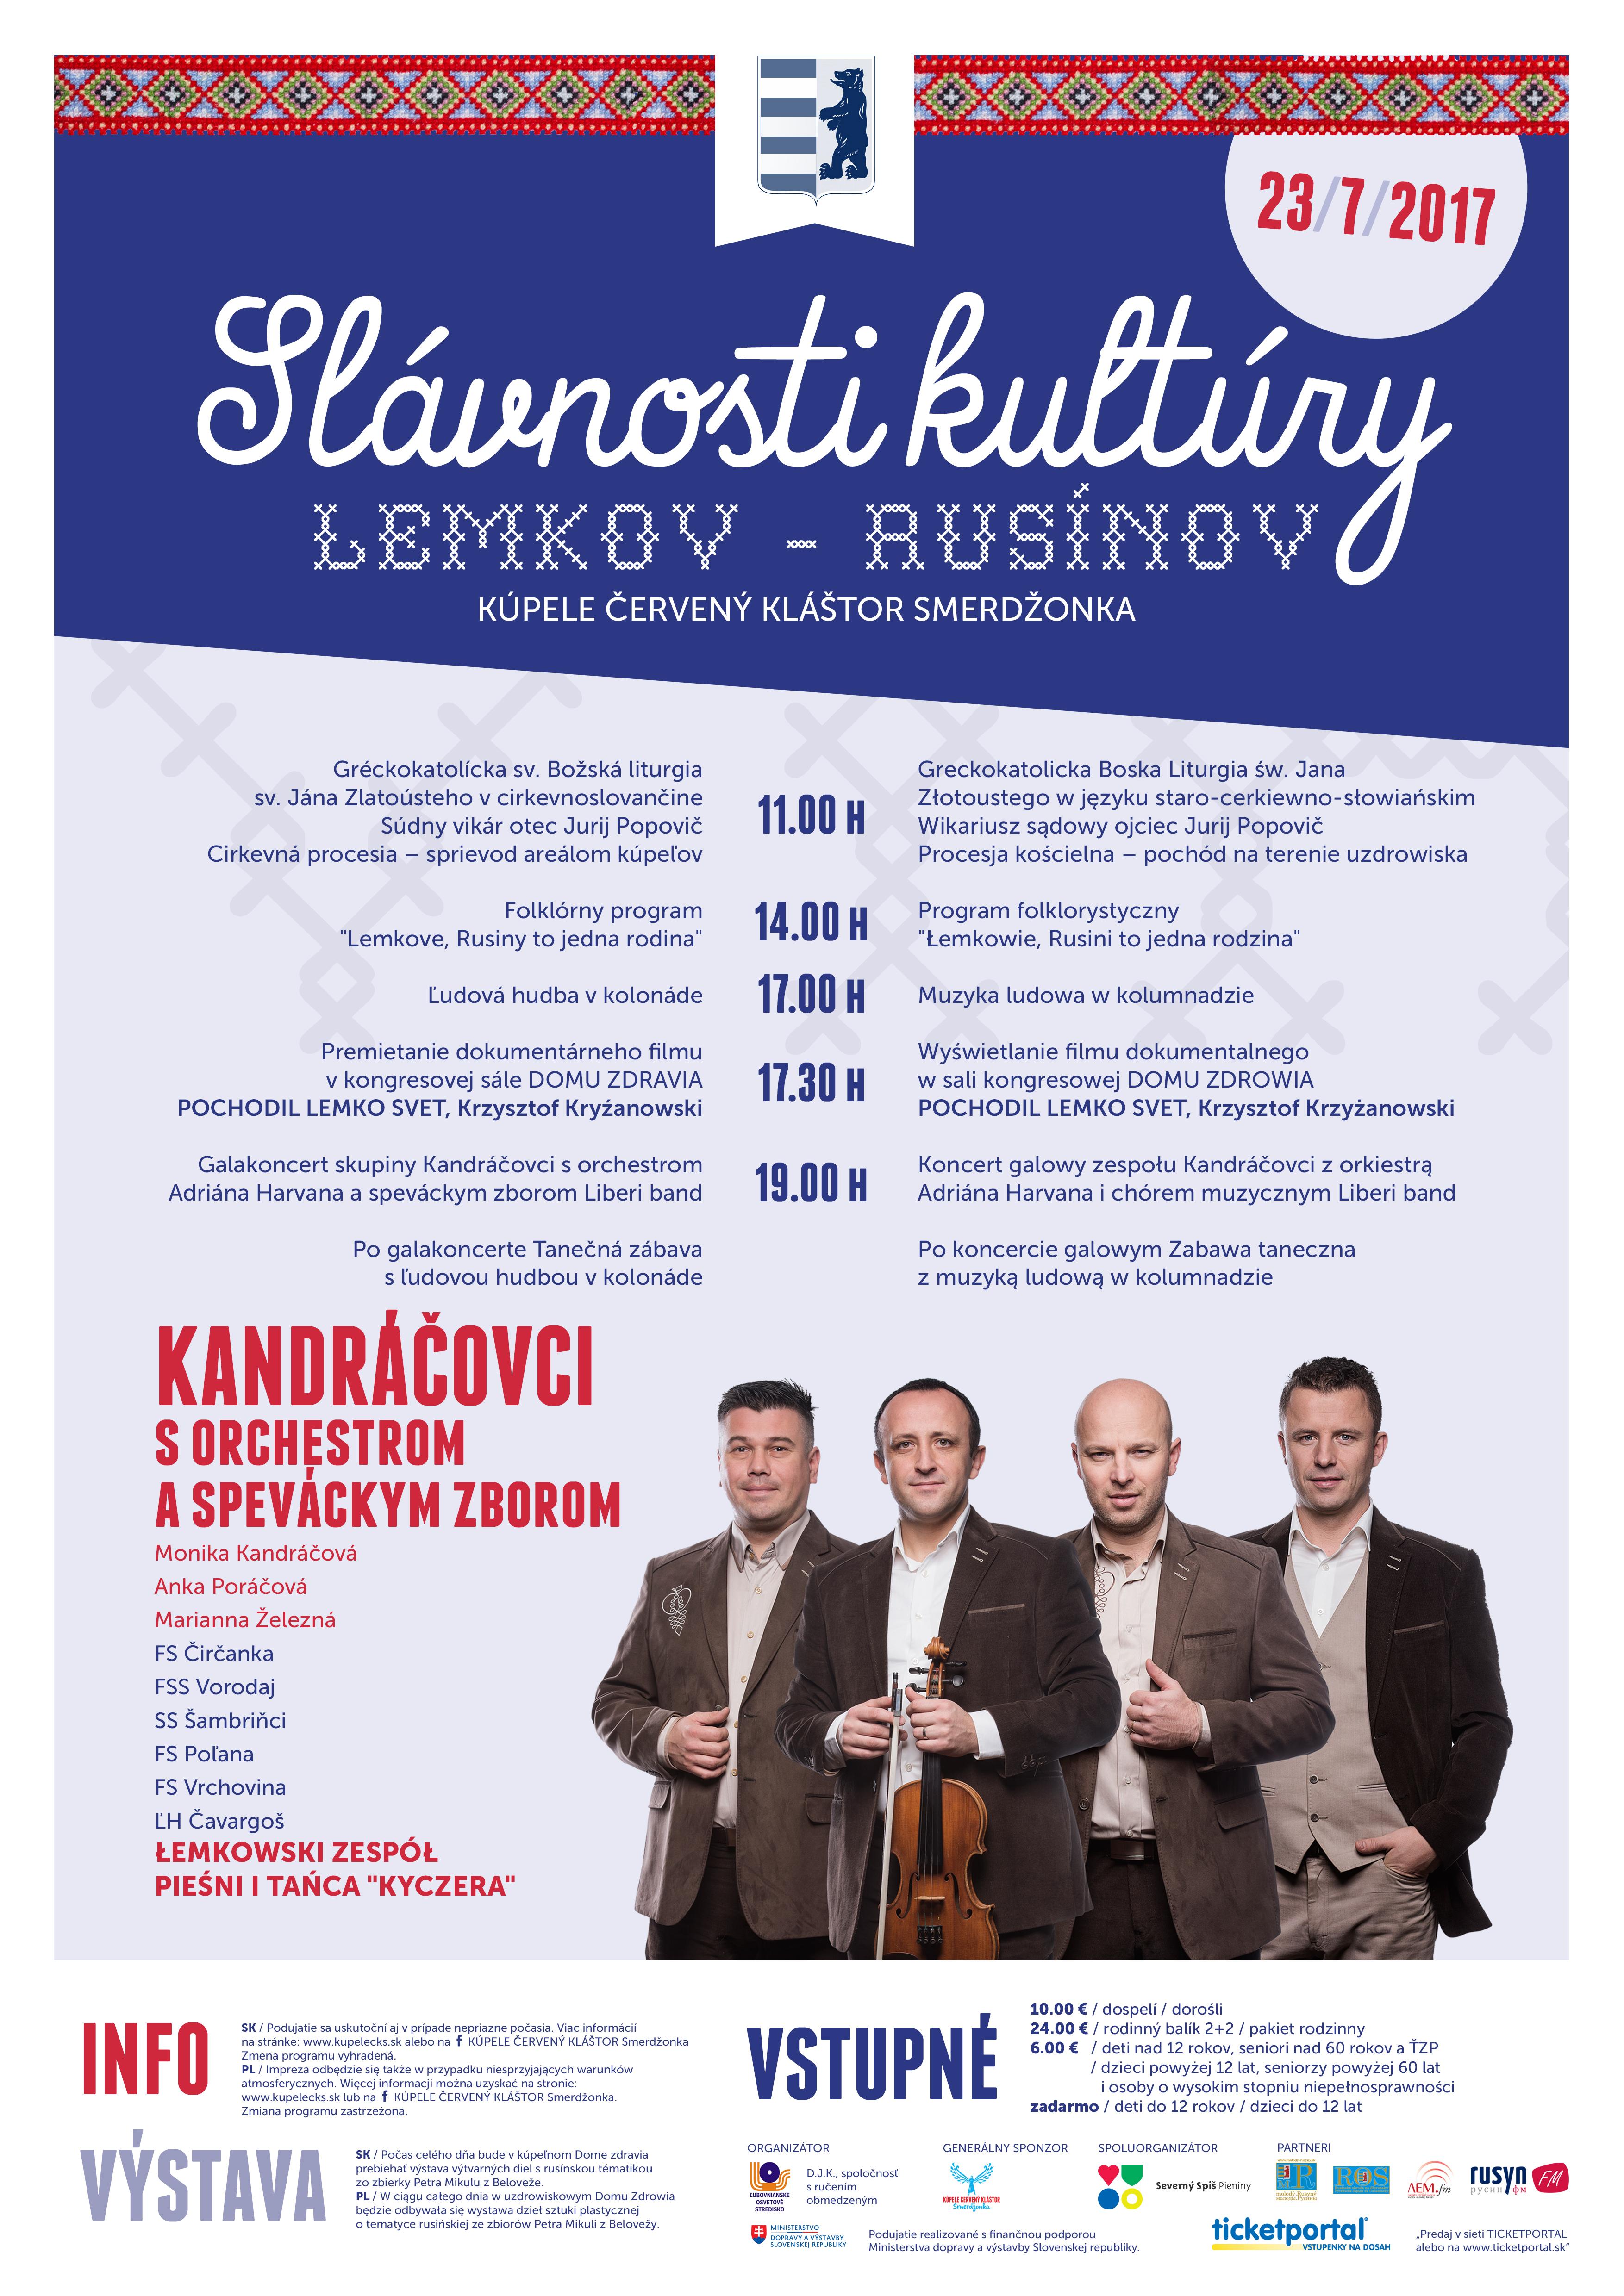 slavnosti kultury lemkov rusinov KCKS2017